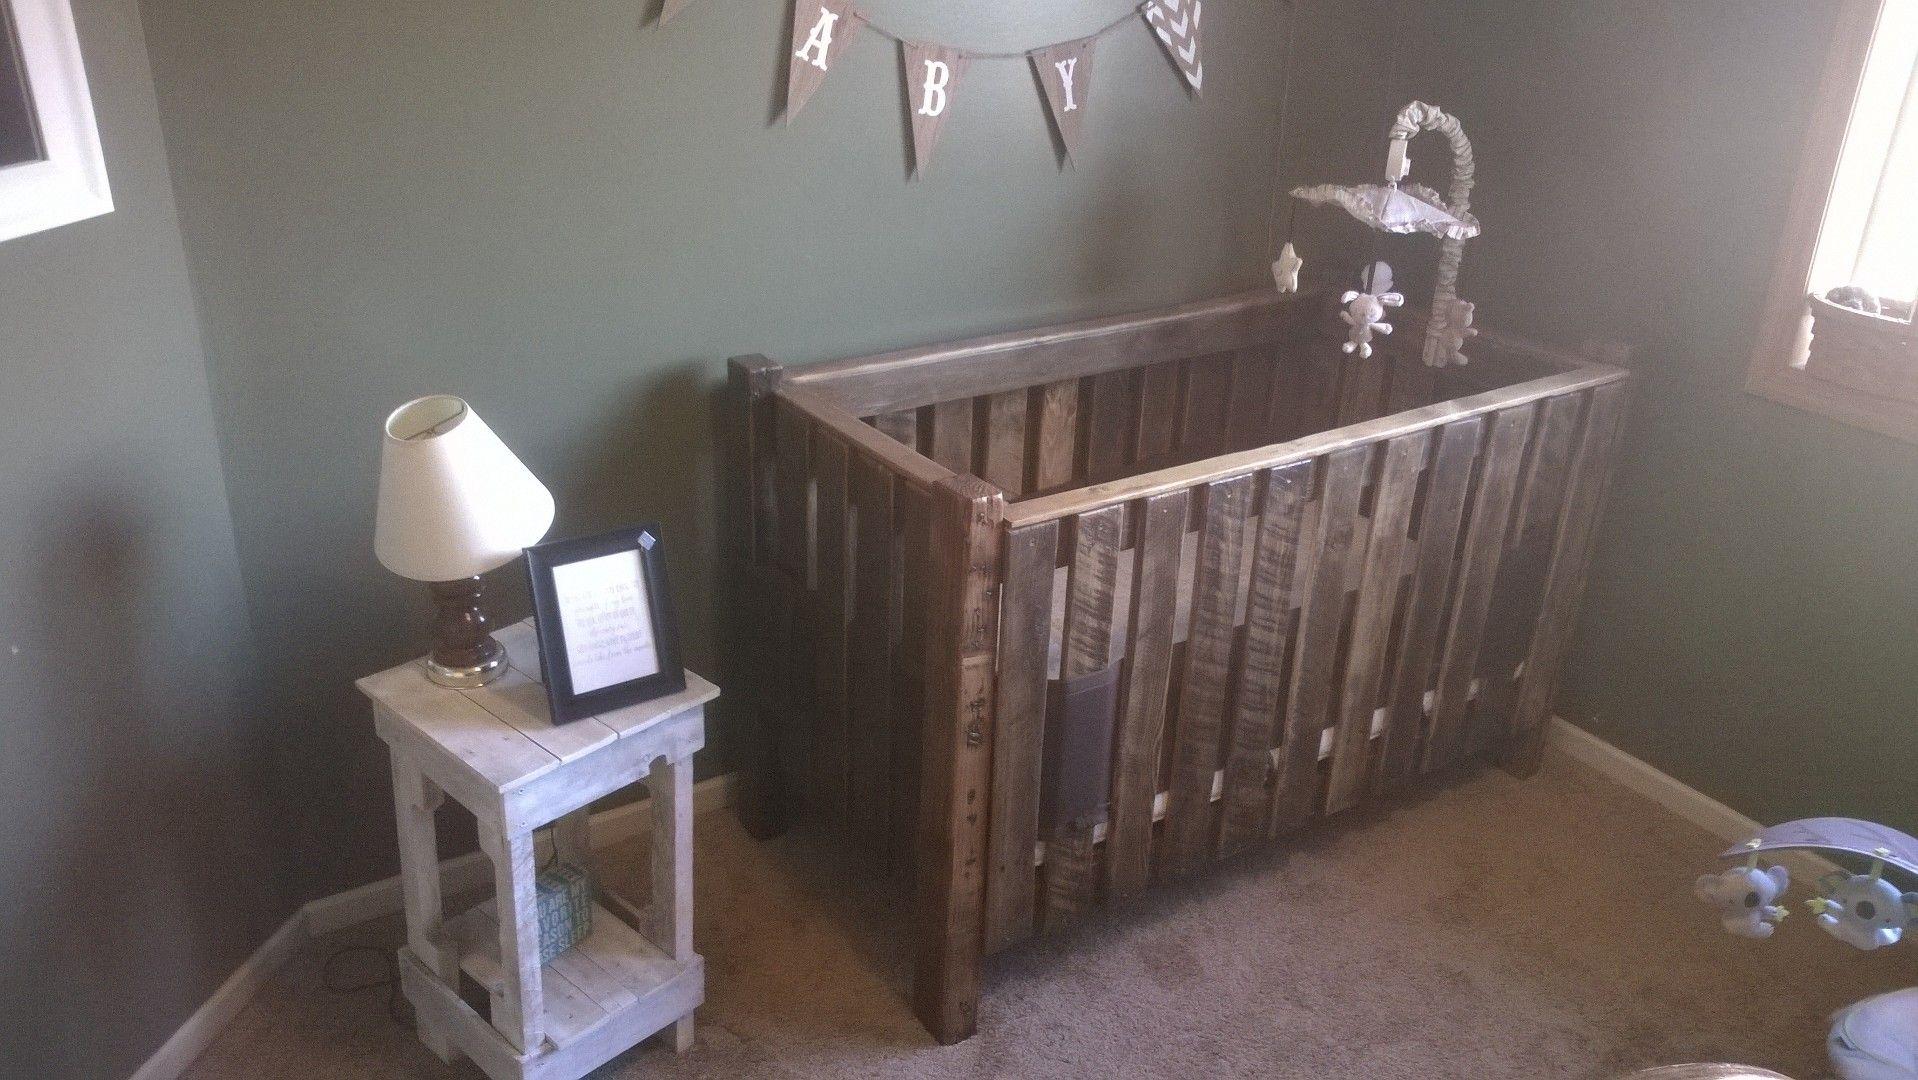 DIY pallet crib | Diy crib, Pallet diy, Baby room decor